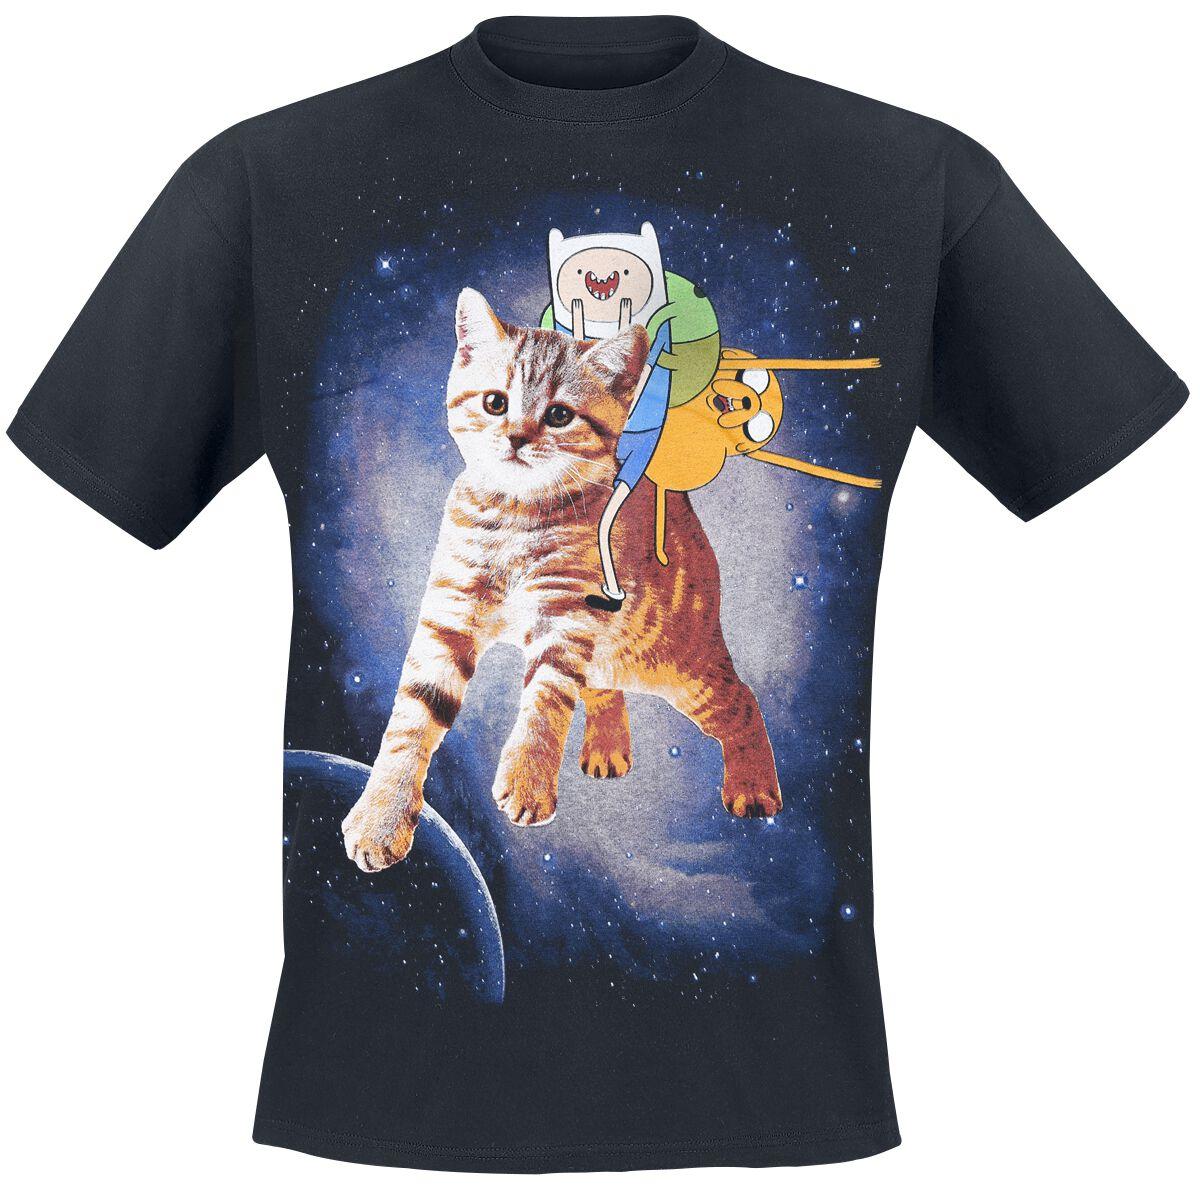 Merch dla Fanów - Koszulki - T-Shirt Adventure Time Finn & Jake Cat T-Shirt czarny - 311373